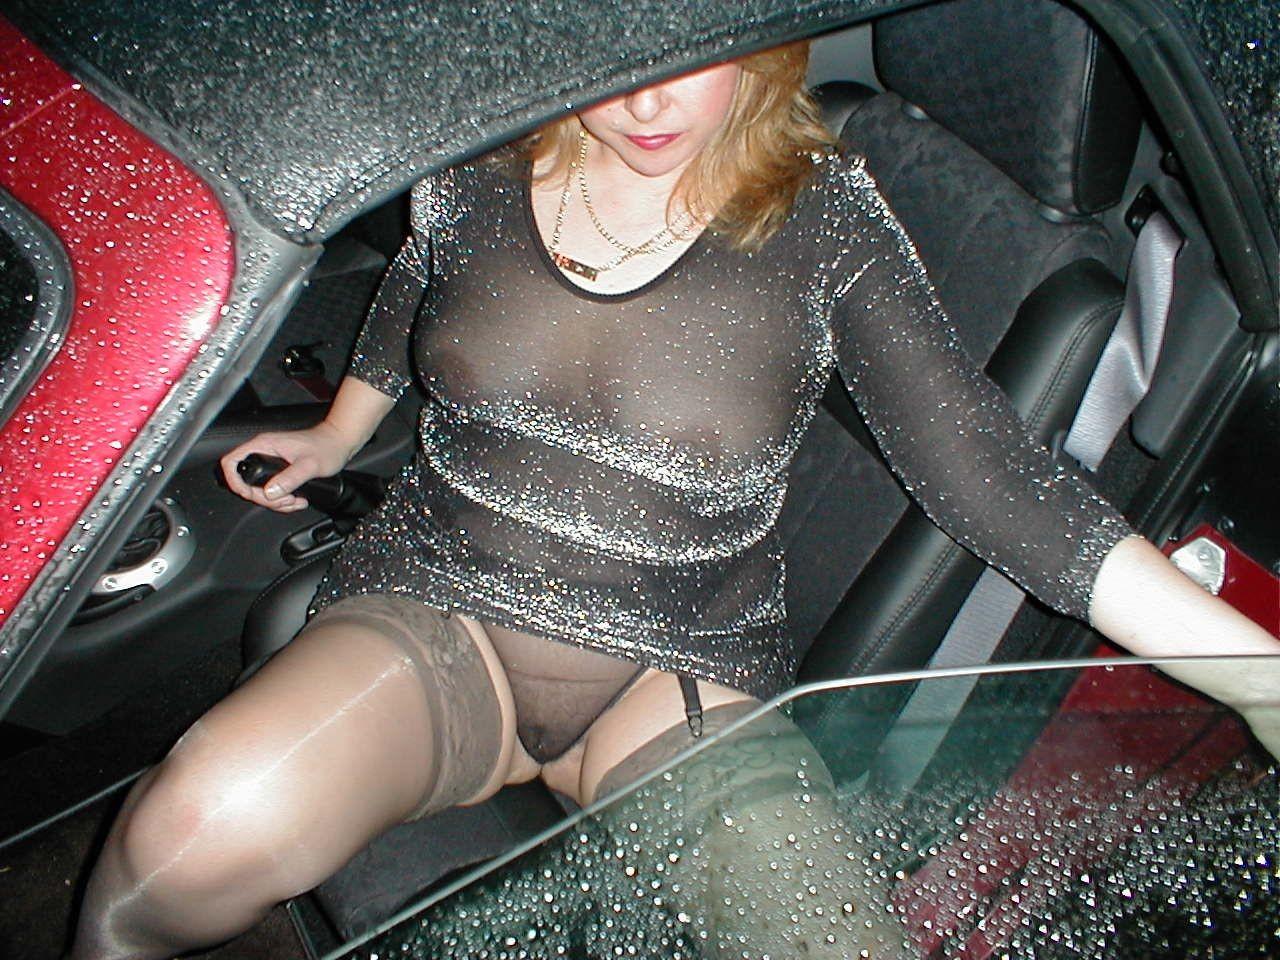 http://pbs-2.adult-empire.com/85/8570/005/pic/1.jpg